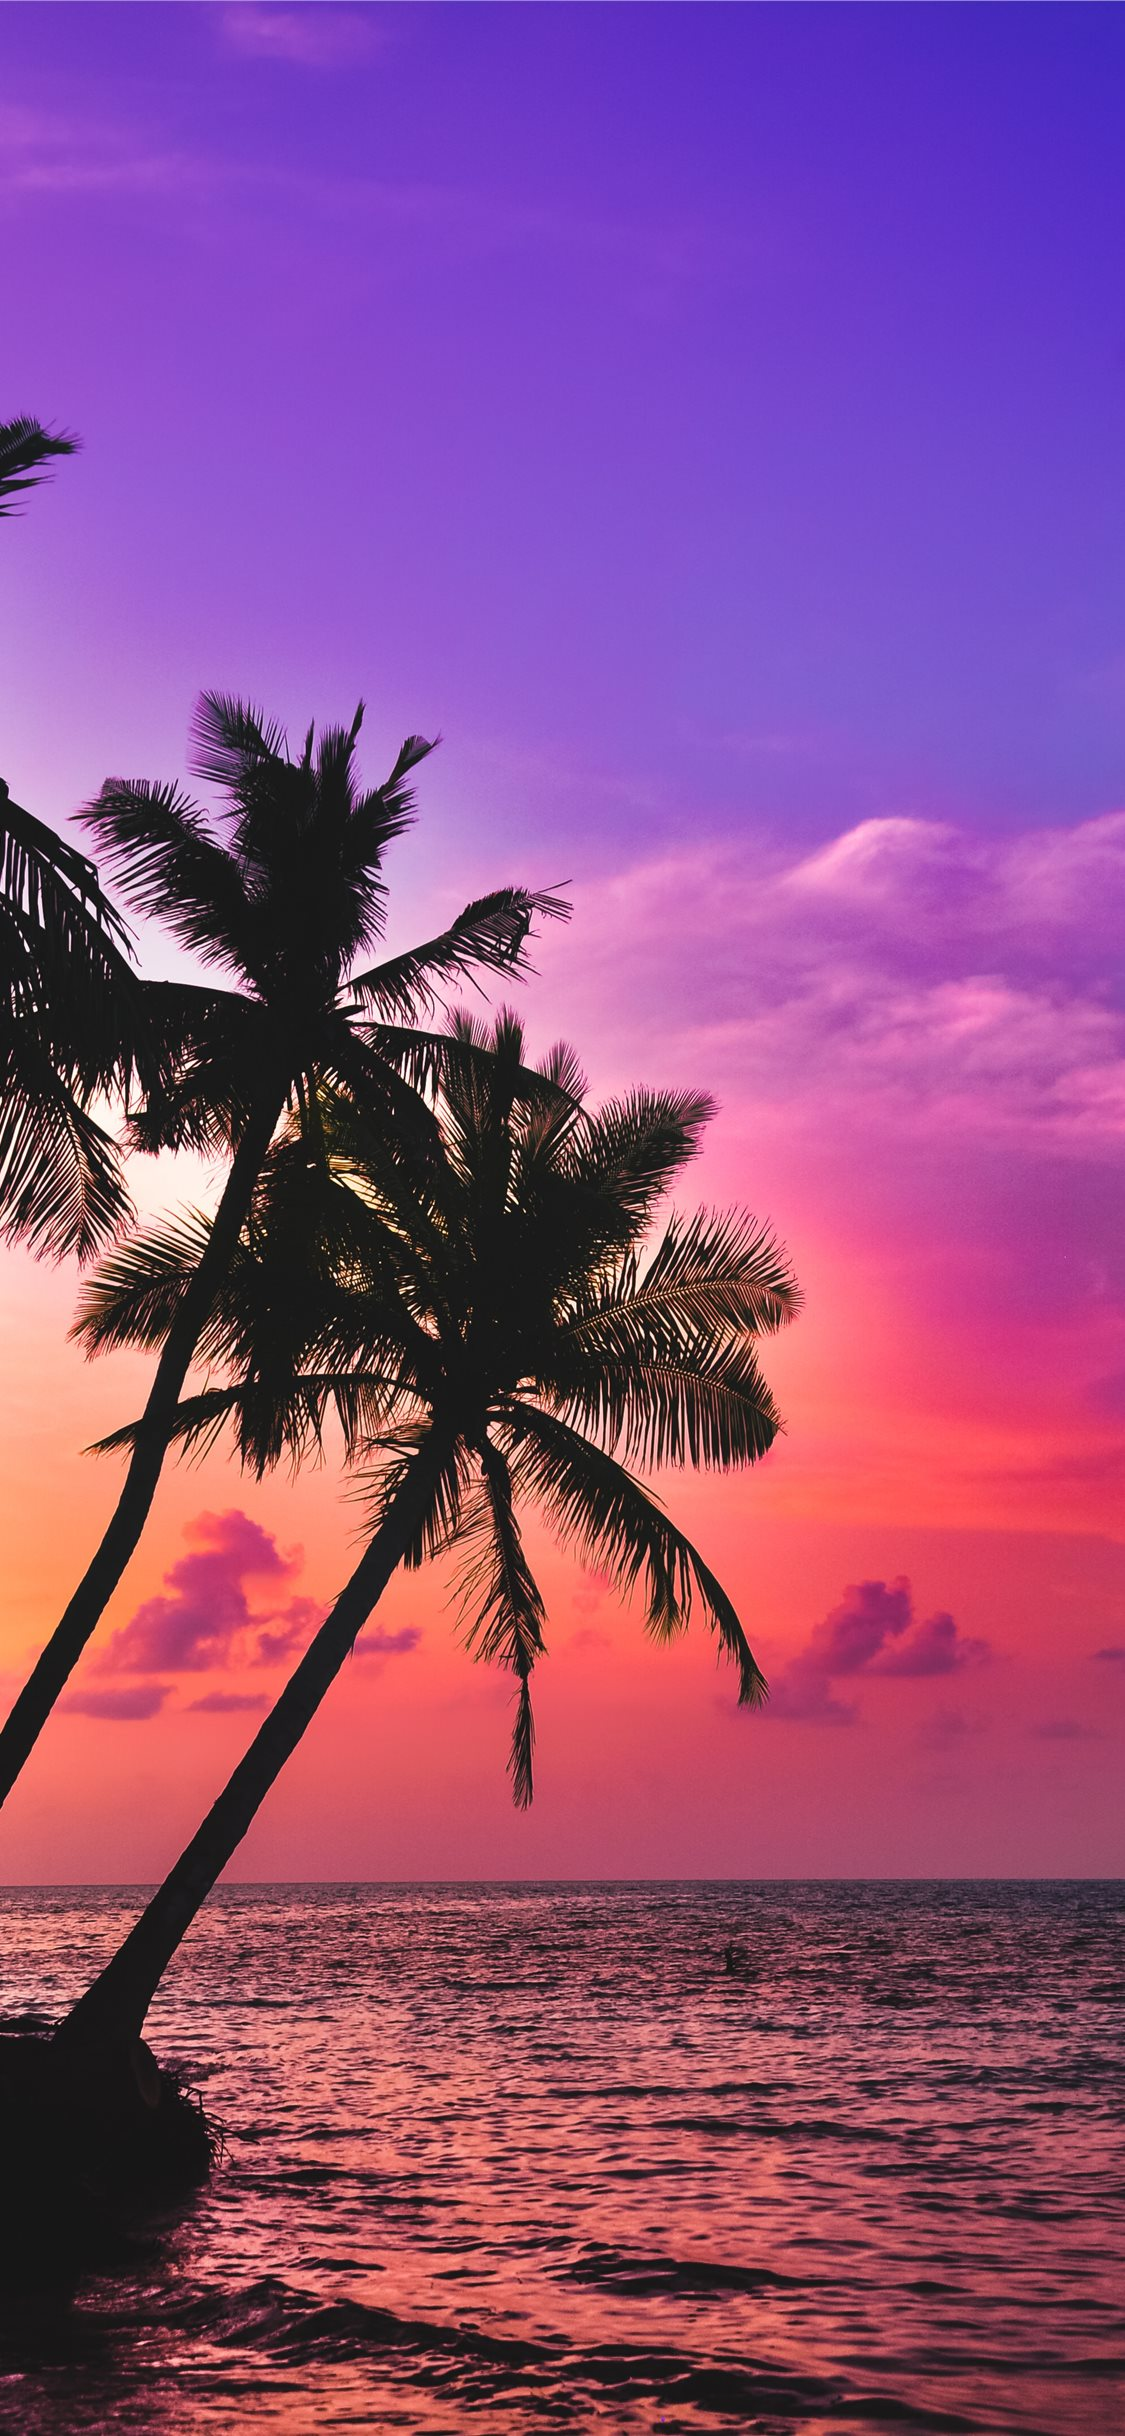 Best Beach Iphone X Wallpapers Hd Ilikewallpaper